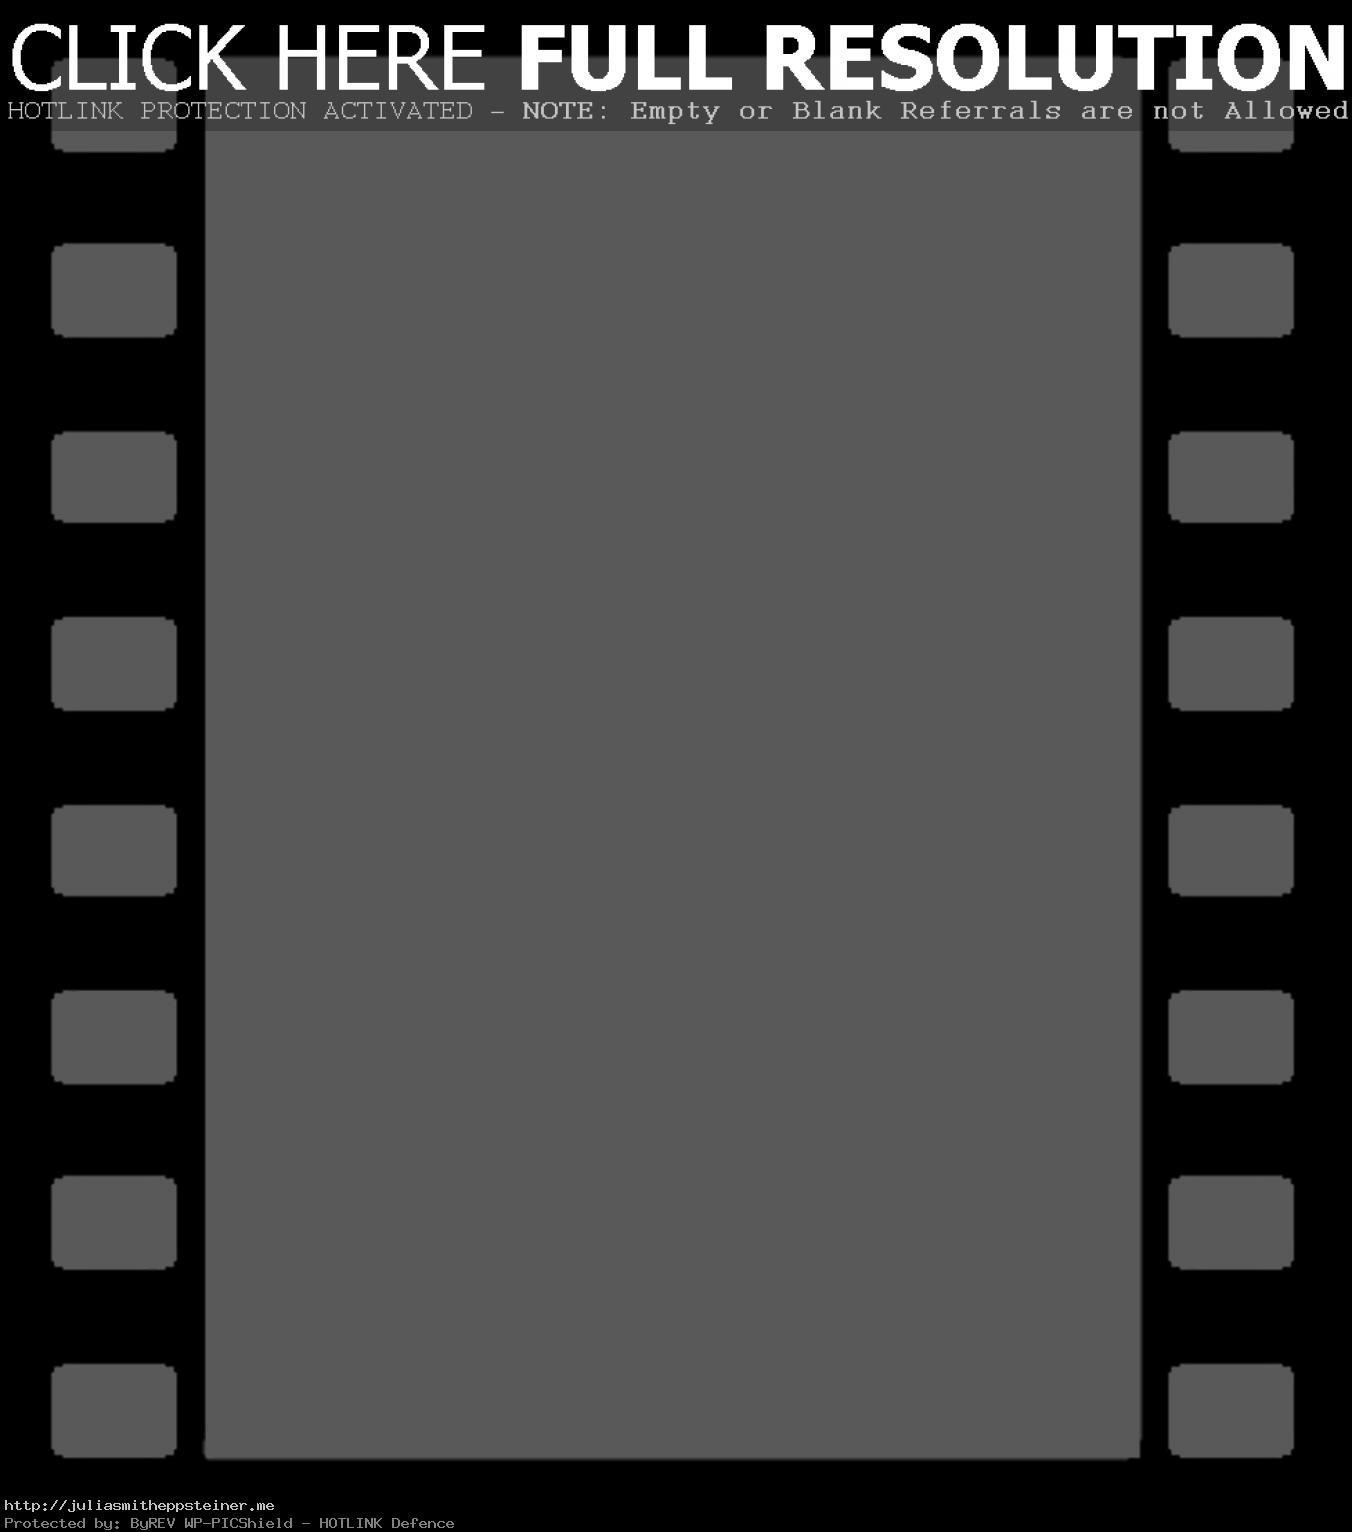 . ClipartLook.com Movie Film Strip Clipart Free Clip Art Images Sonlight Studios ClipartLook.com